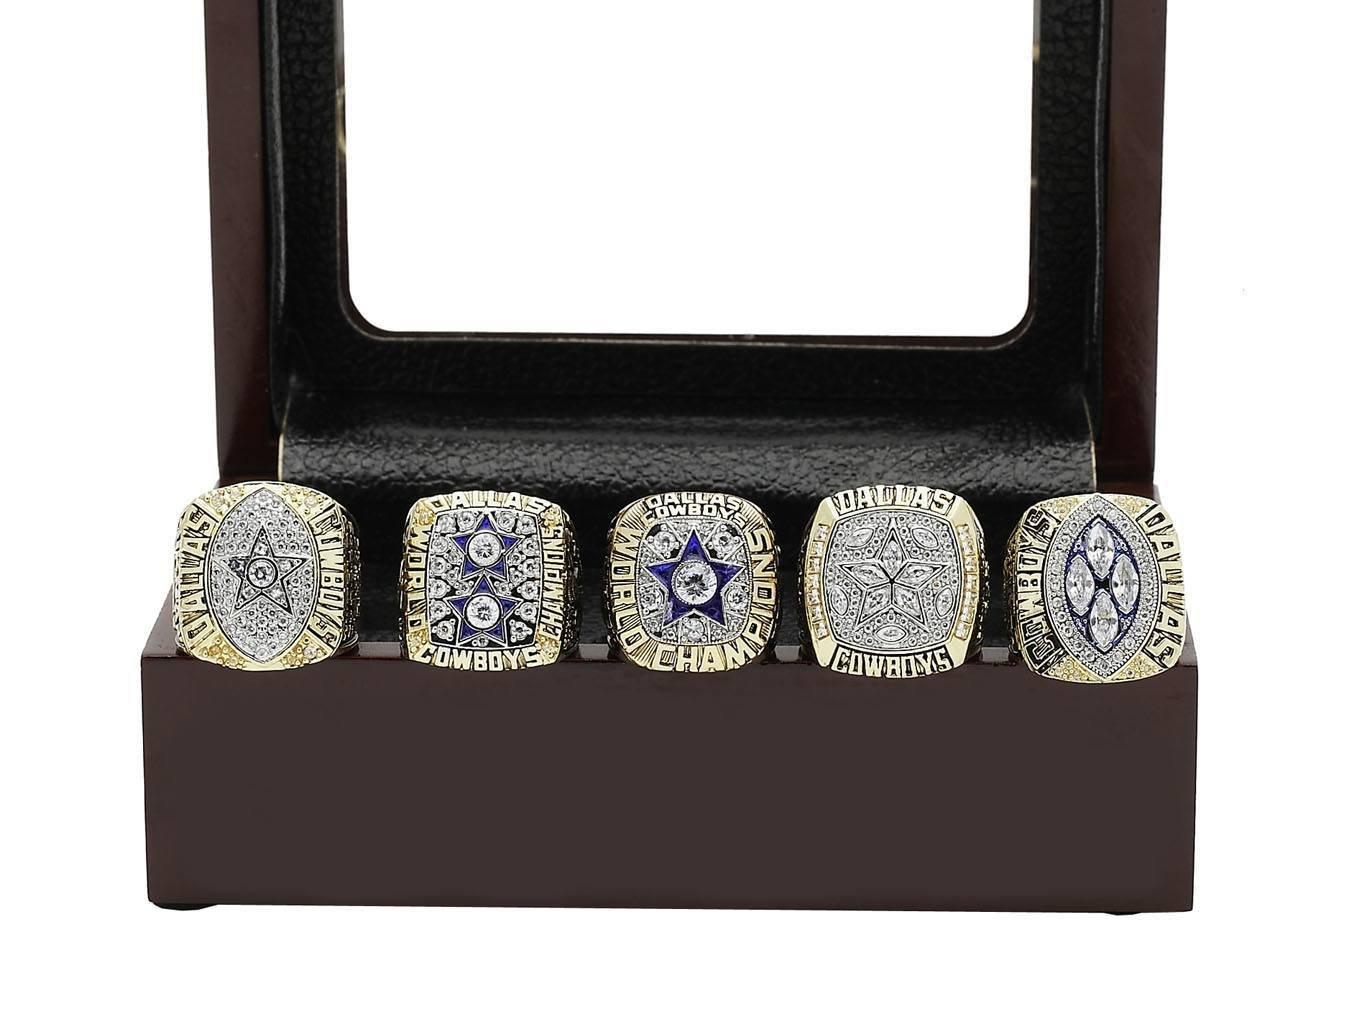 c285385b9 Amazon.com : Dallas Cowboys Supper Bowl Championship Rings Full Set Replica  : Sports & Outdoors